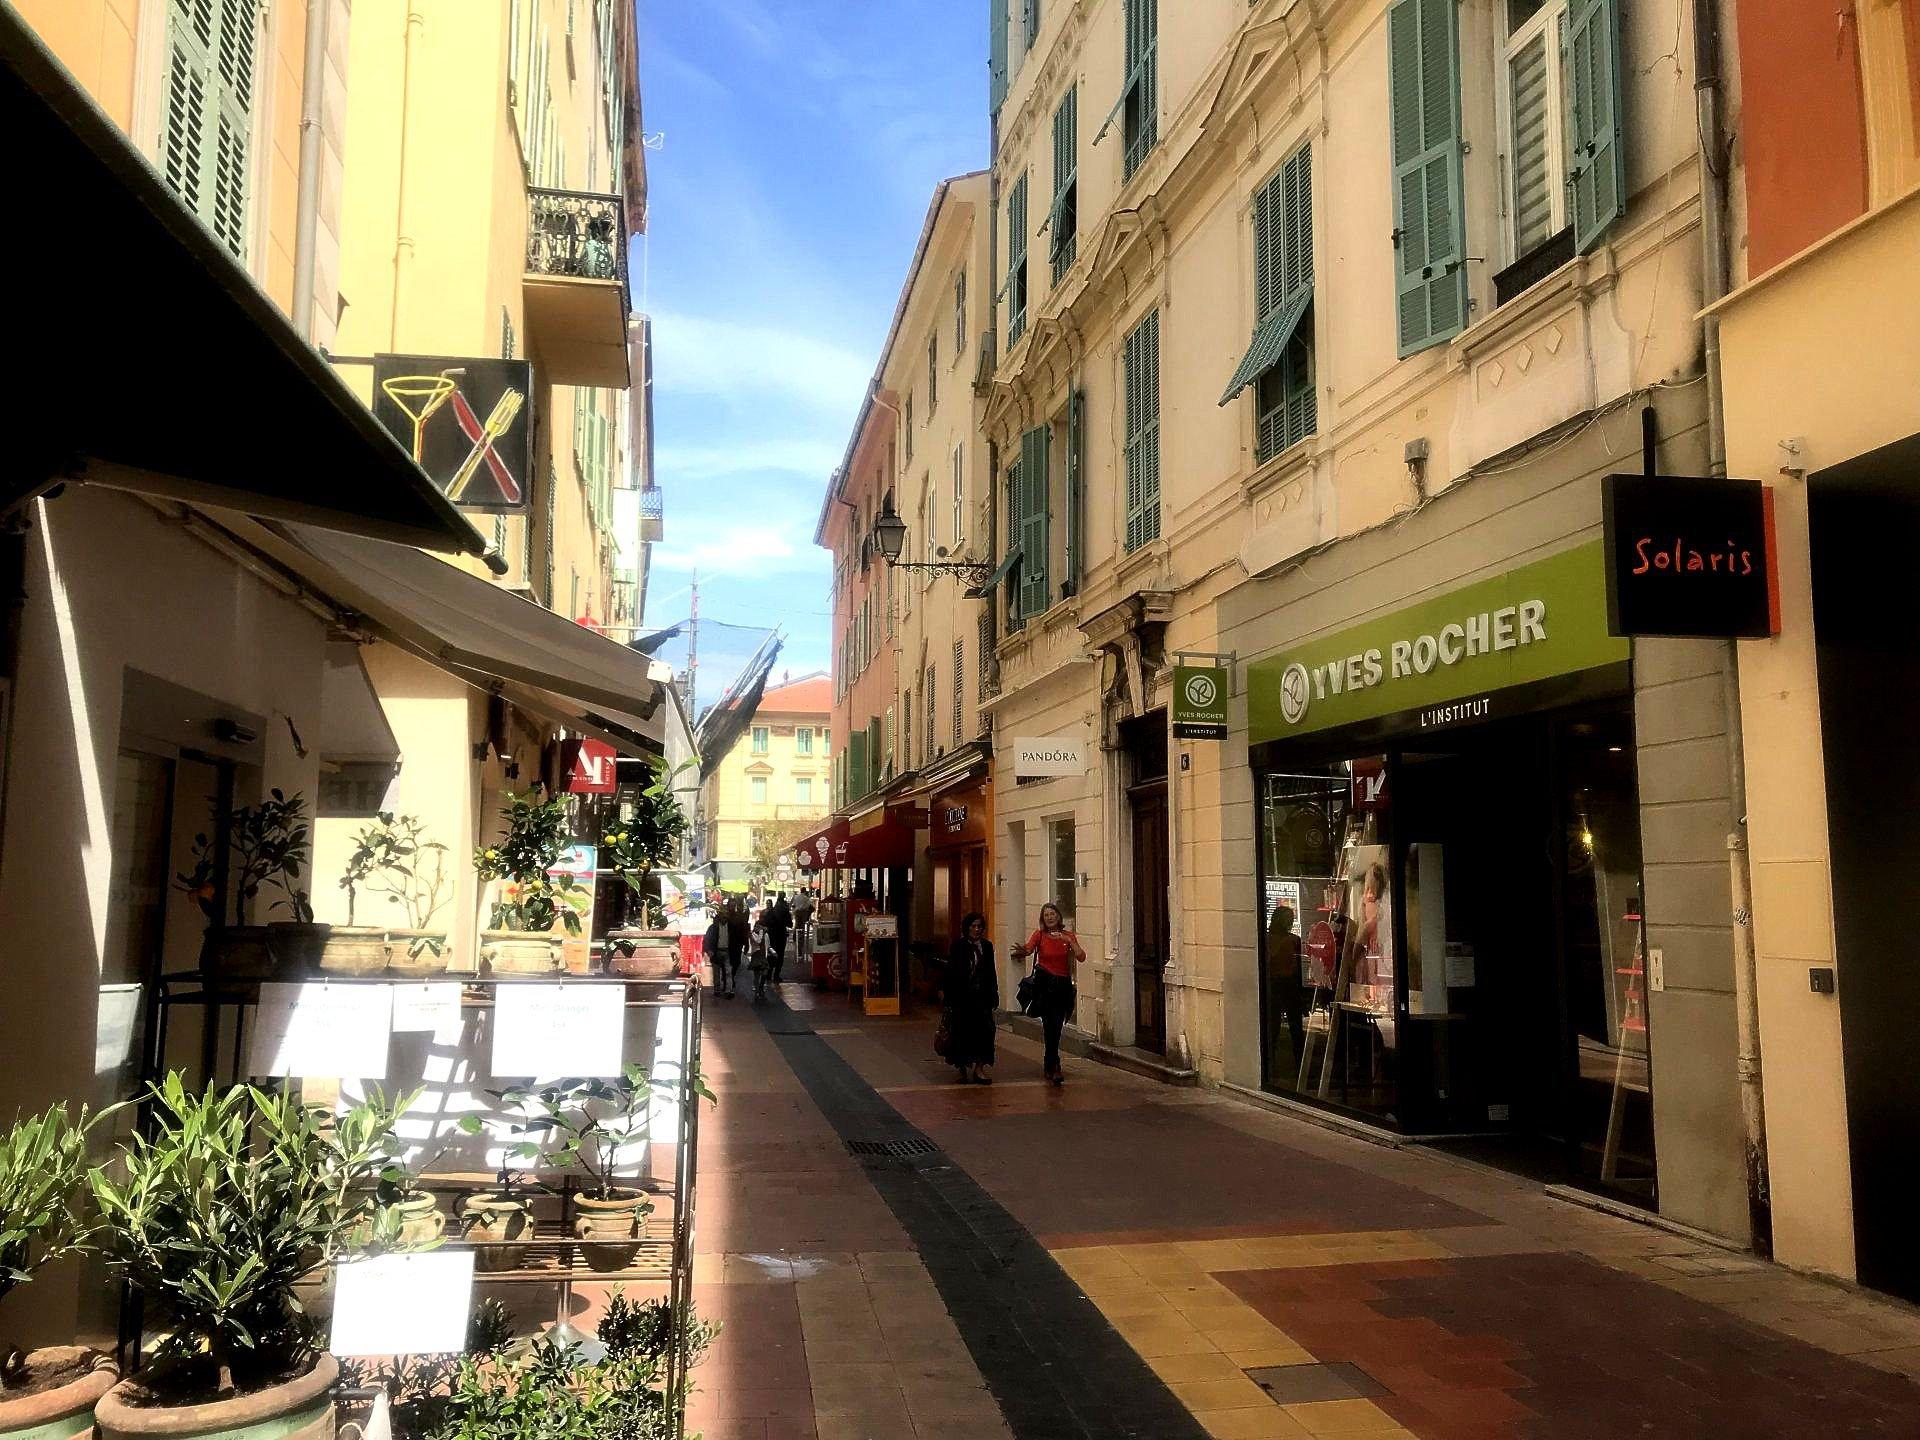 Vendita Avviamento - Mentone (Menton) Piétonne